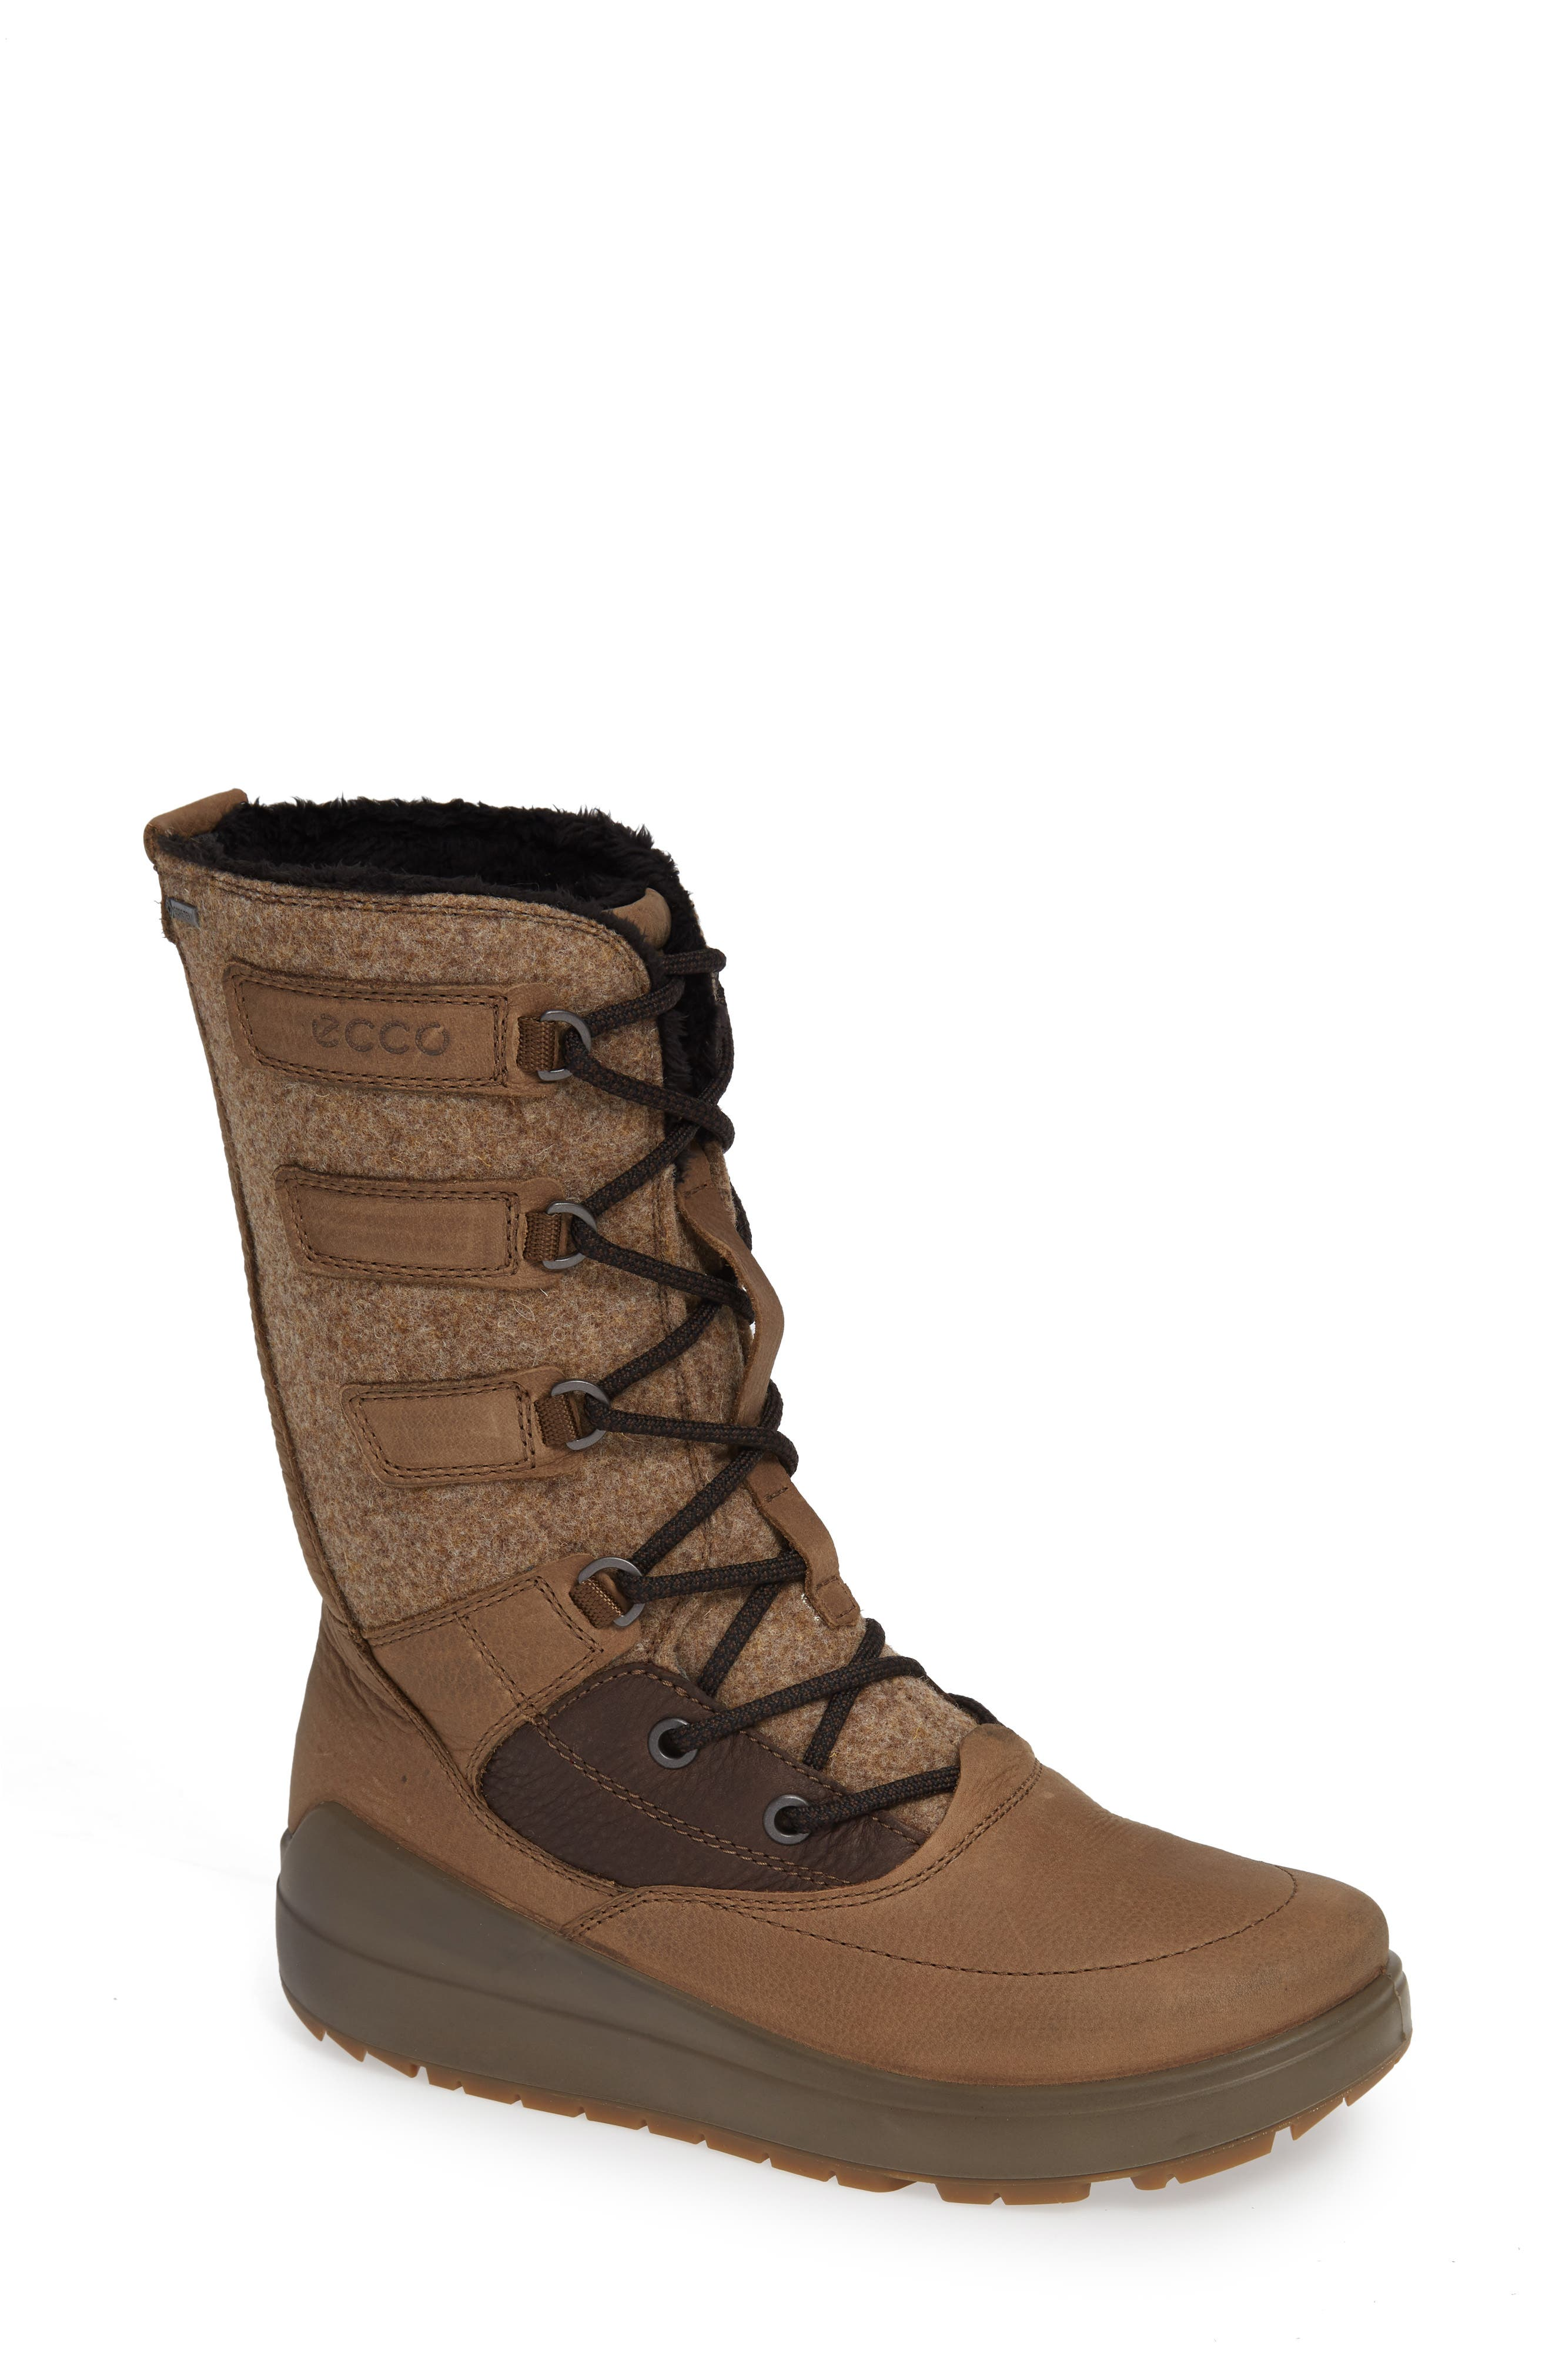 Ecco Noyce Waterproof Boot, Brown